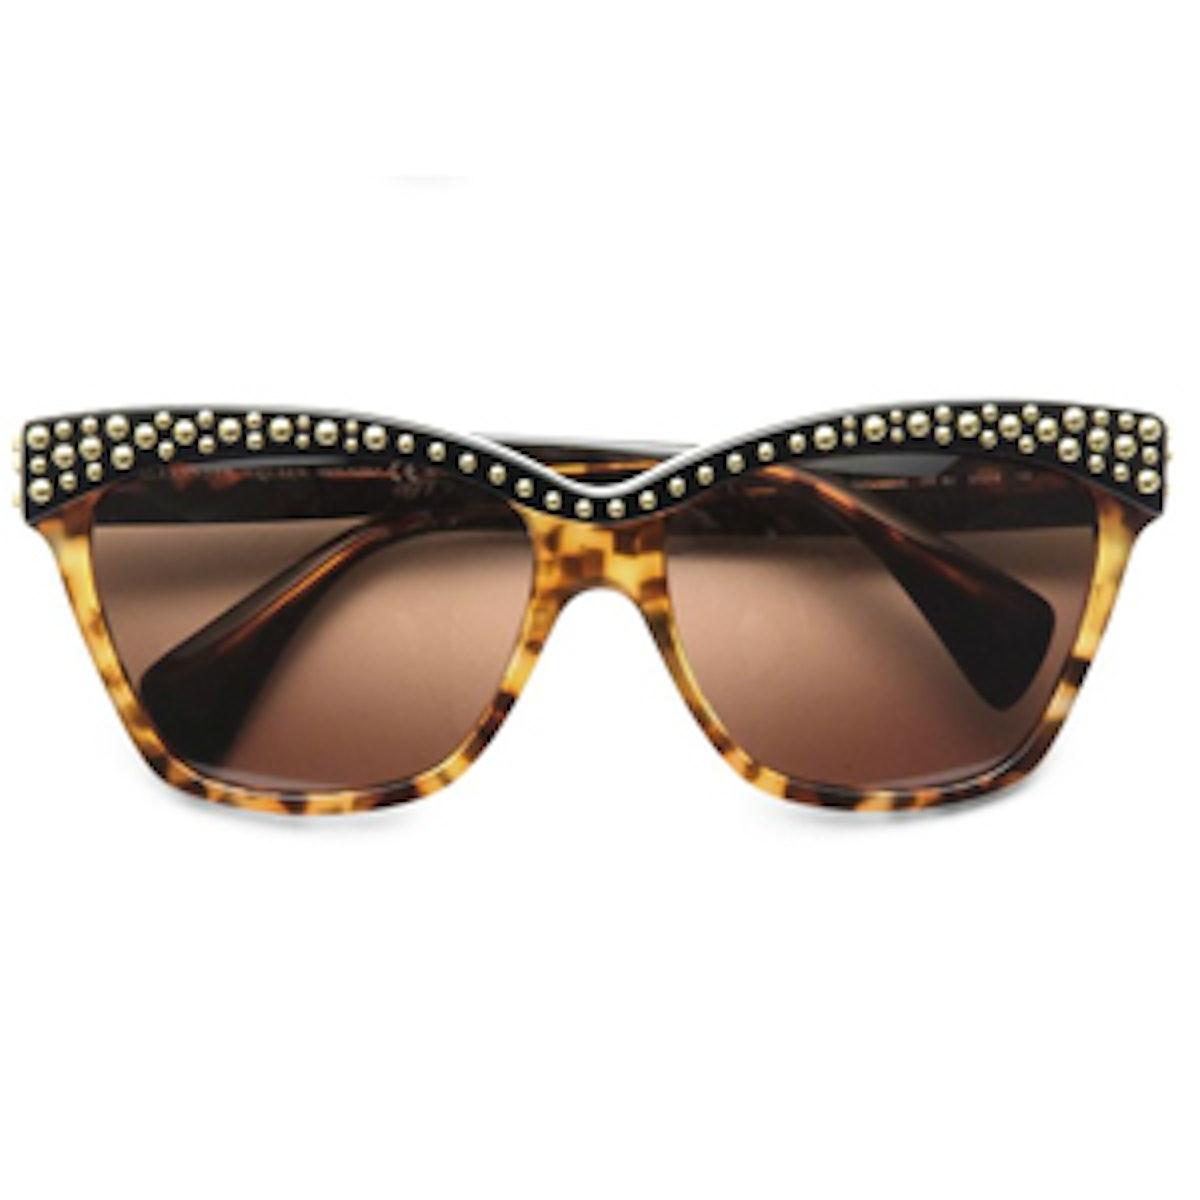 Studded Acetate Cat's Eye Sunglasses